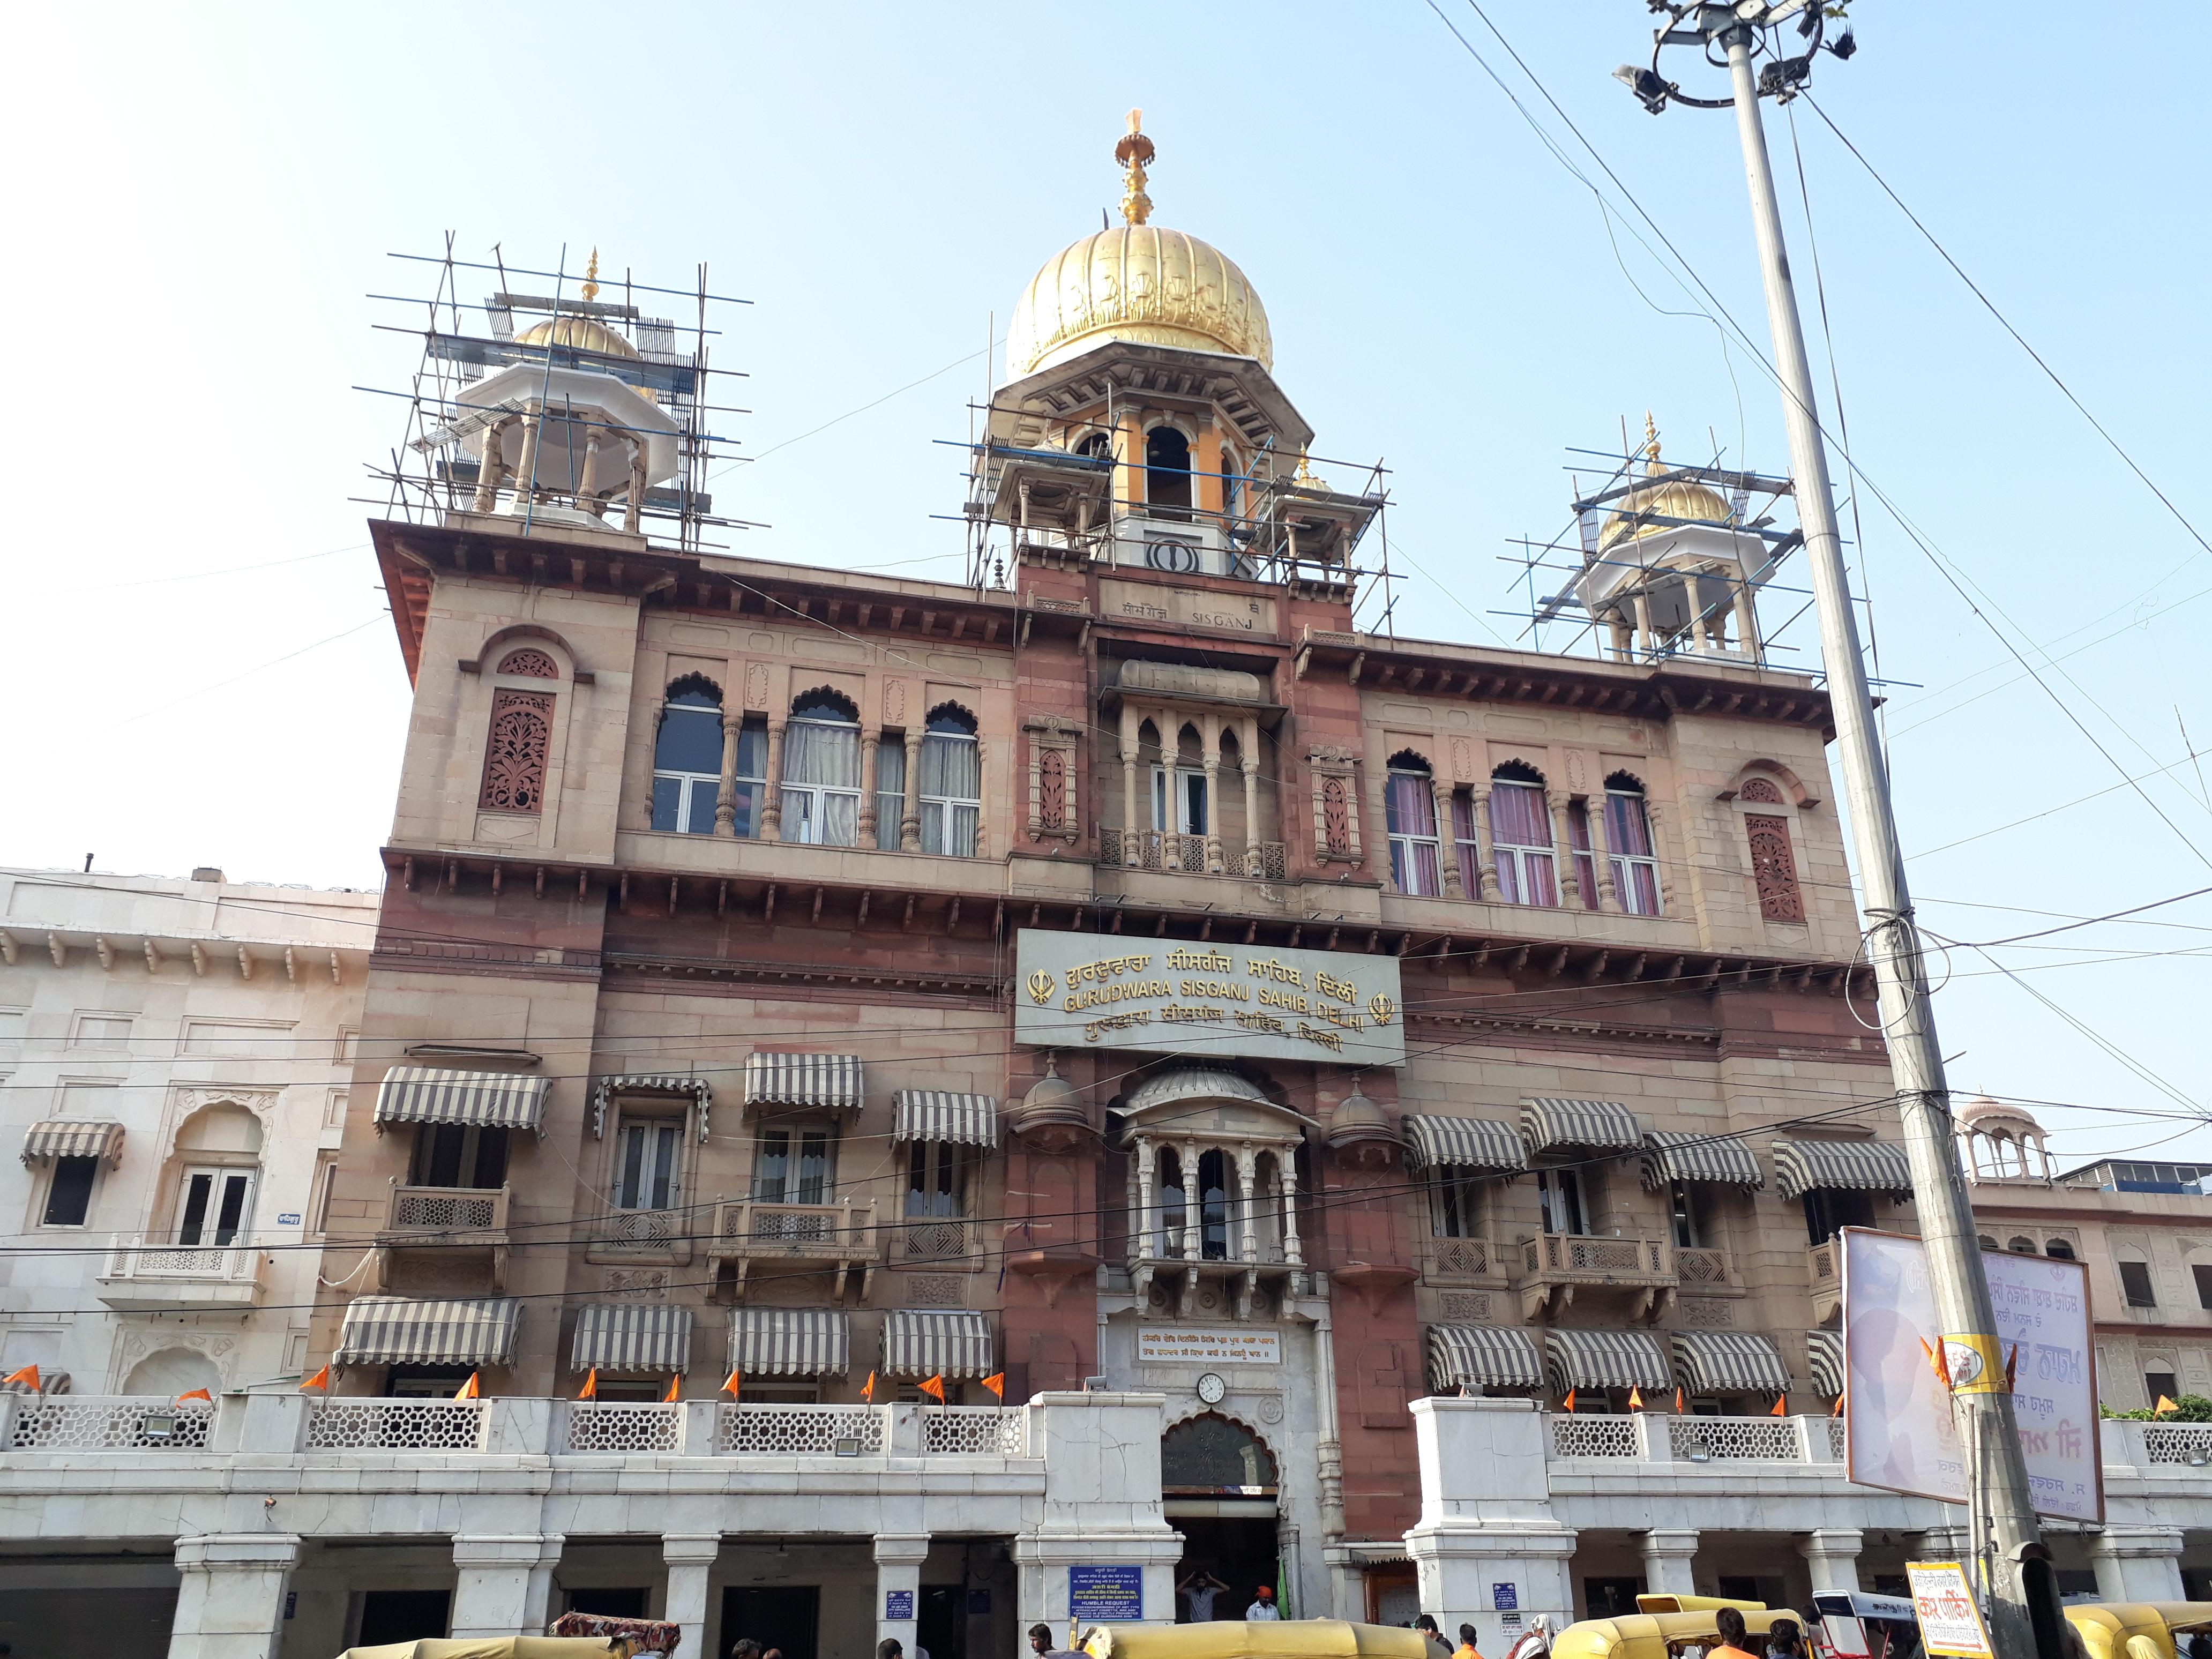 Gurudwara Sis Ganj Sahib - Wikipedia